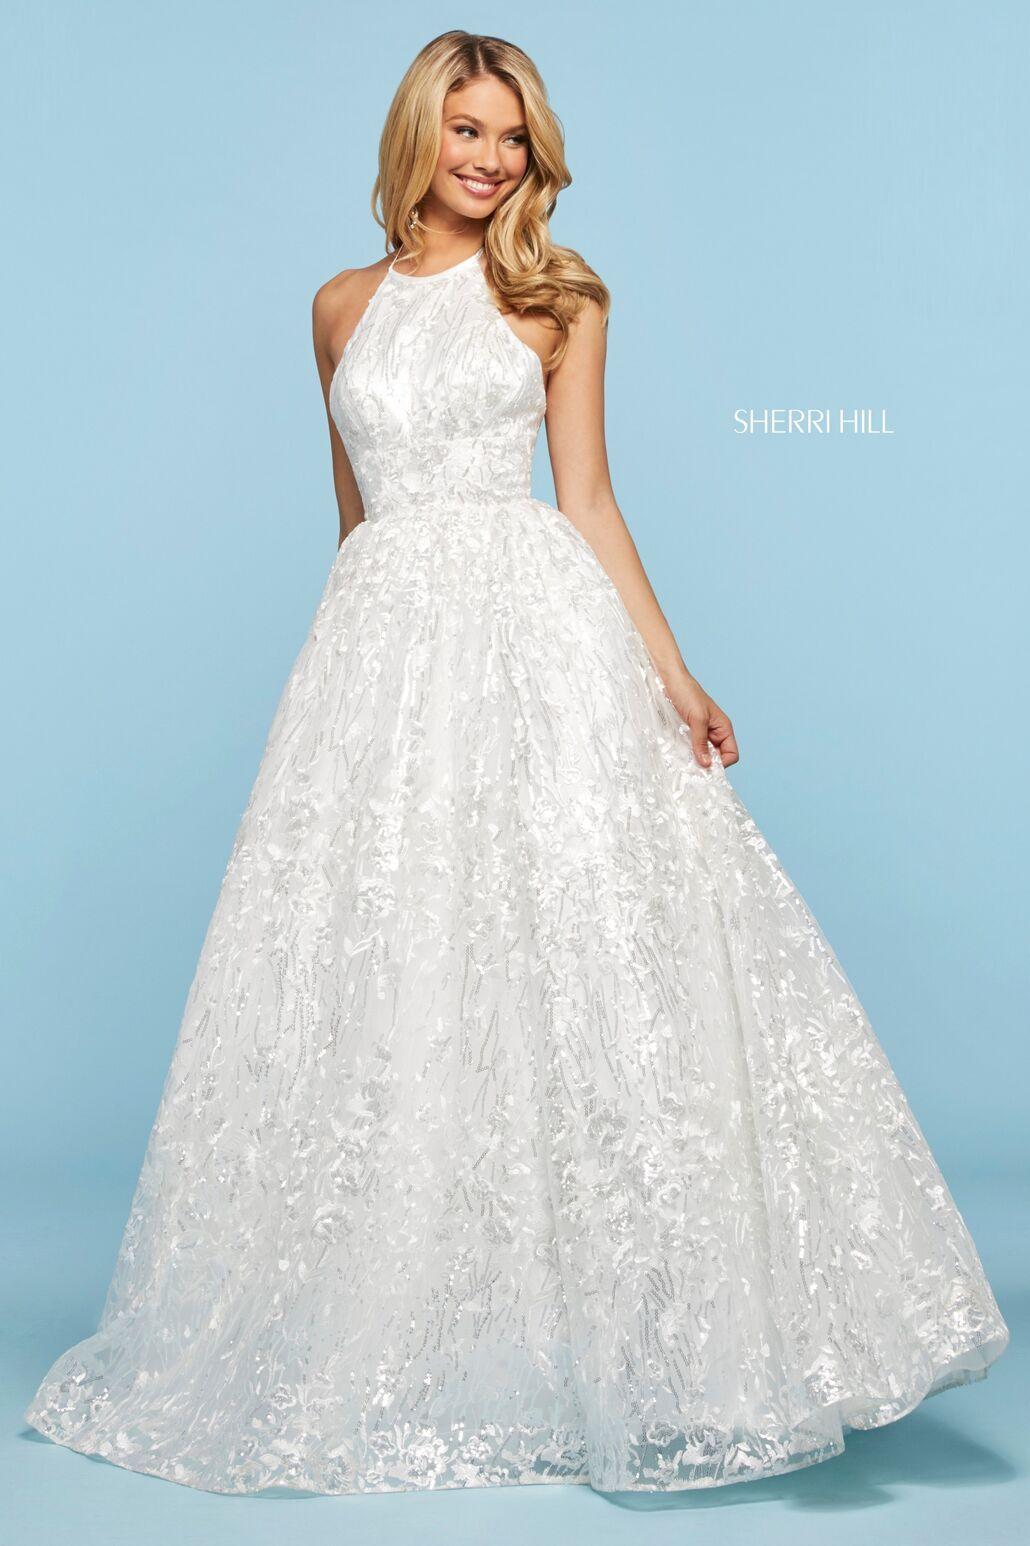 Sherri Hill 53655 In 2020 Sherri Hill Wedding Dresses Pageant Dresses Dresses,Fall Black Tie Wedding Guest Dresses